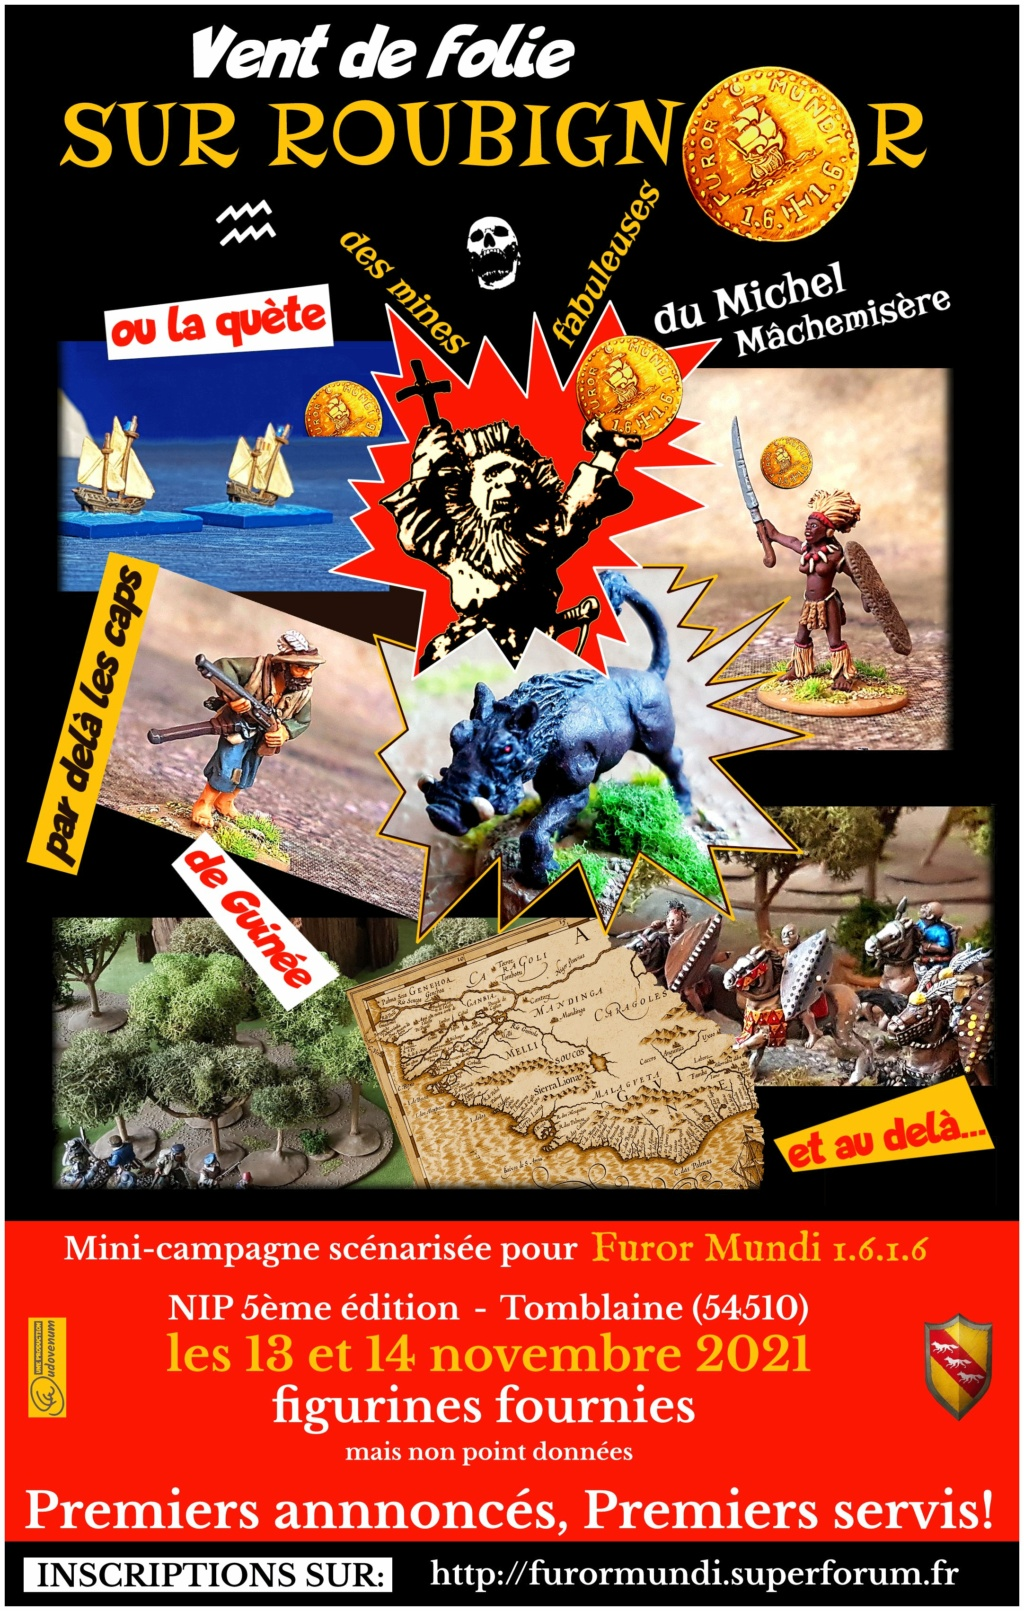 [NIP V] INVITATION A ROUBIGNOR - mini campagne Furor Mundi - 13 ET 14 NOV -  NANCY Compob18